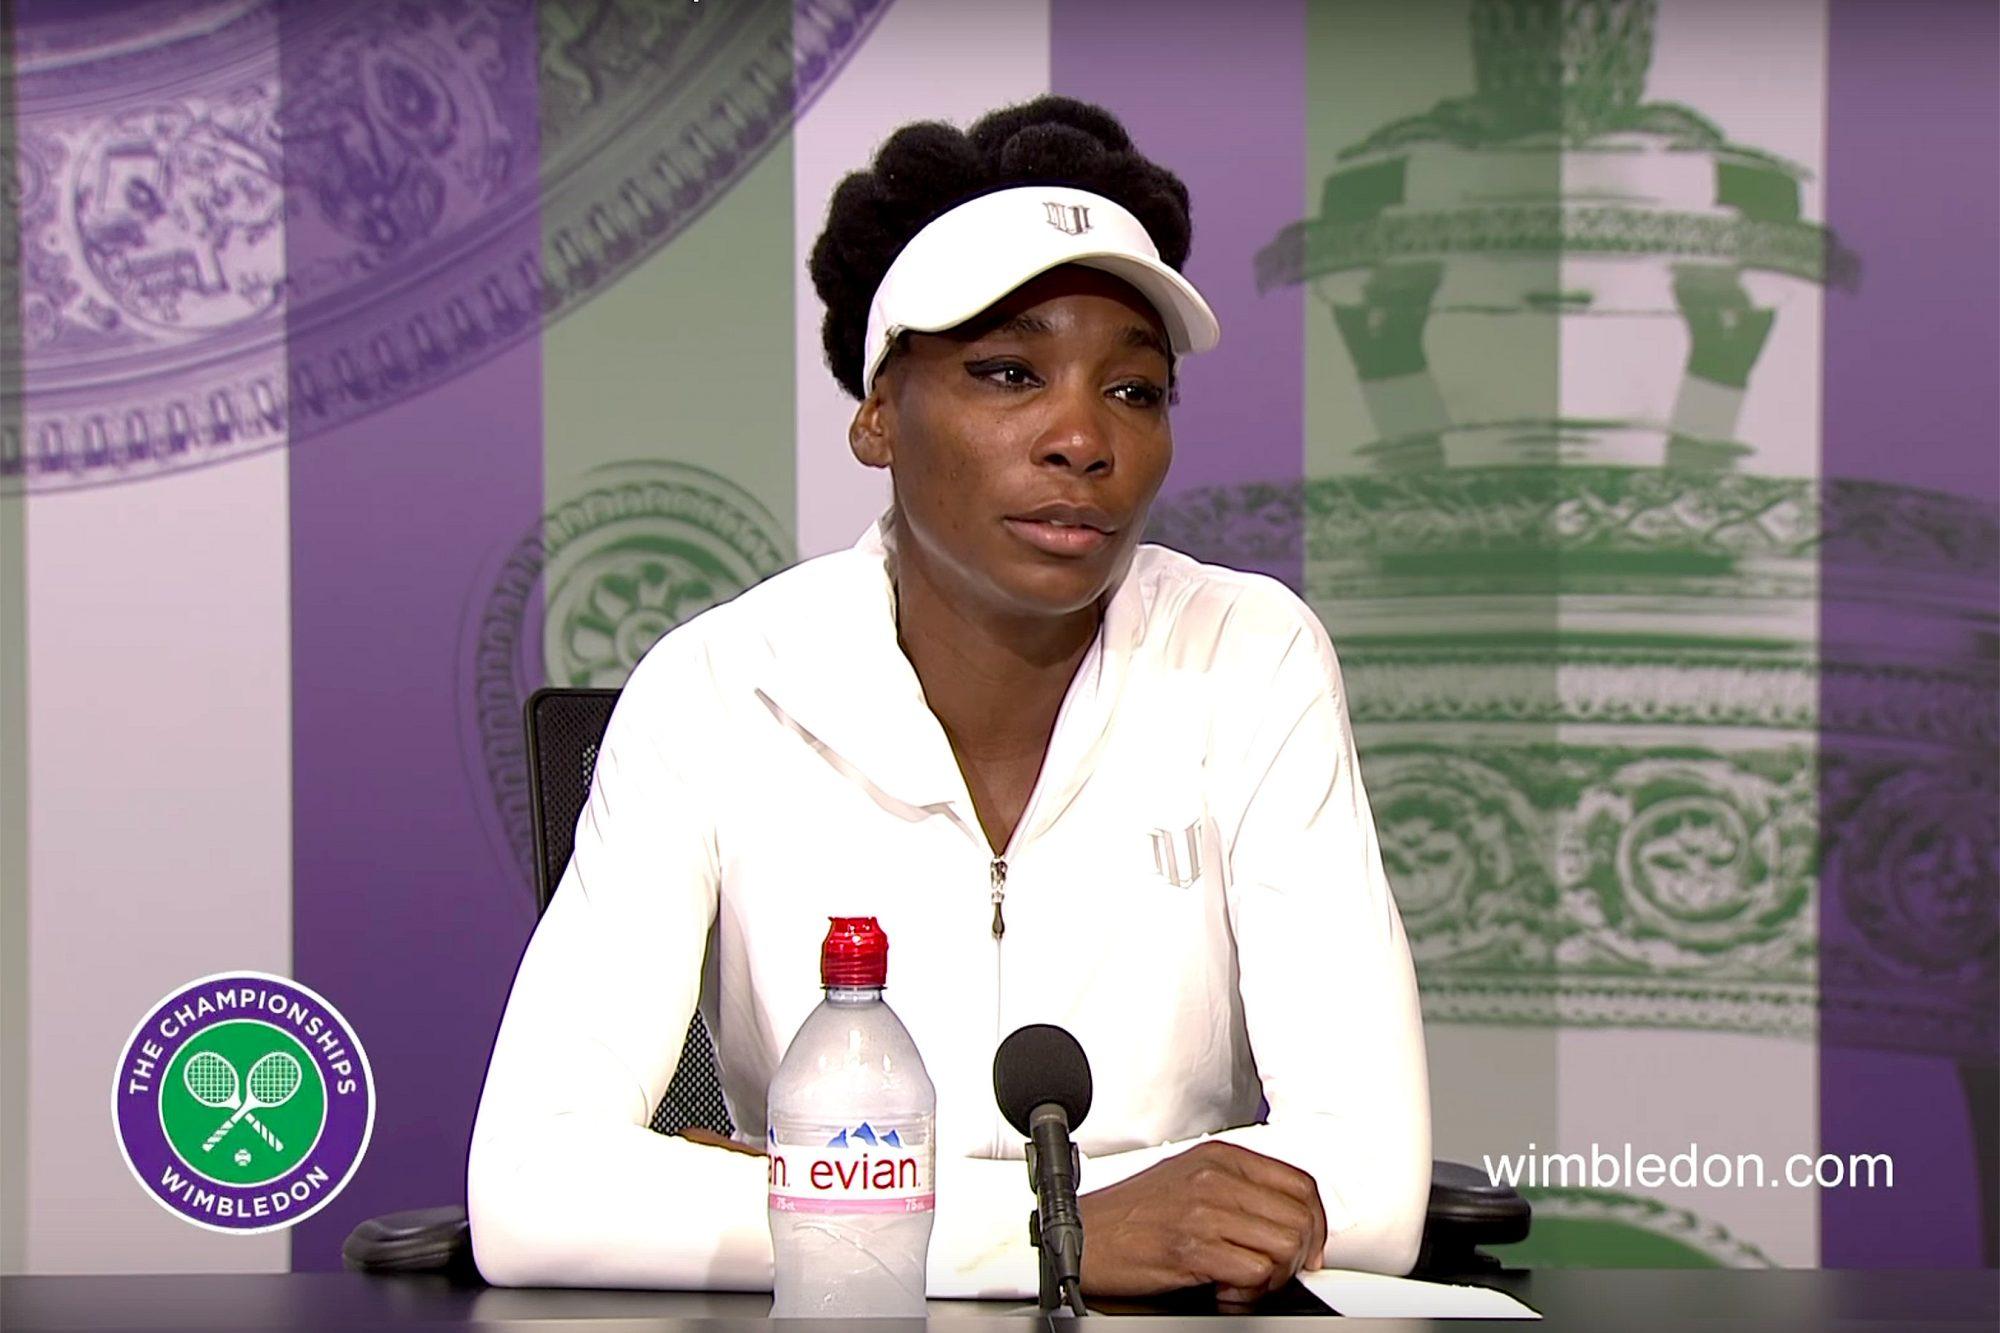 Venus Williams at Wimbledon press conference